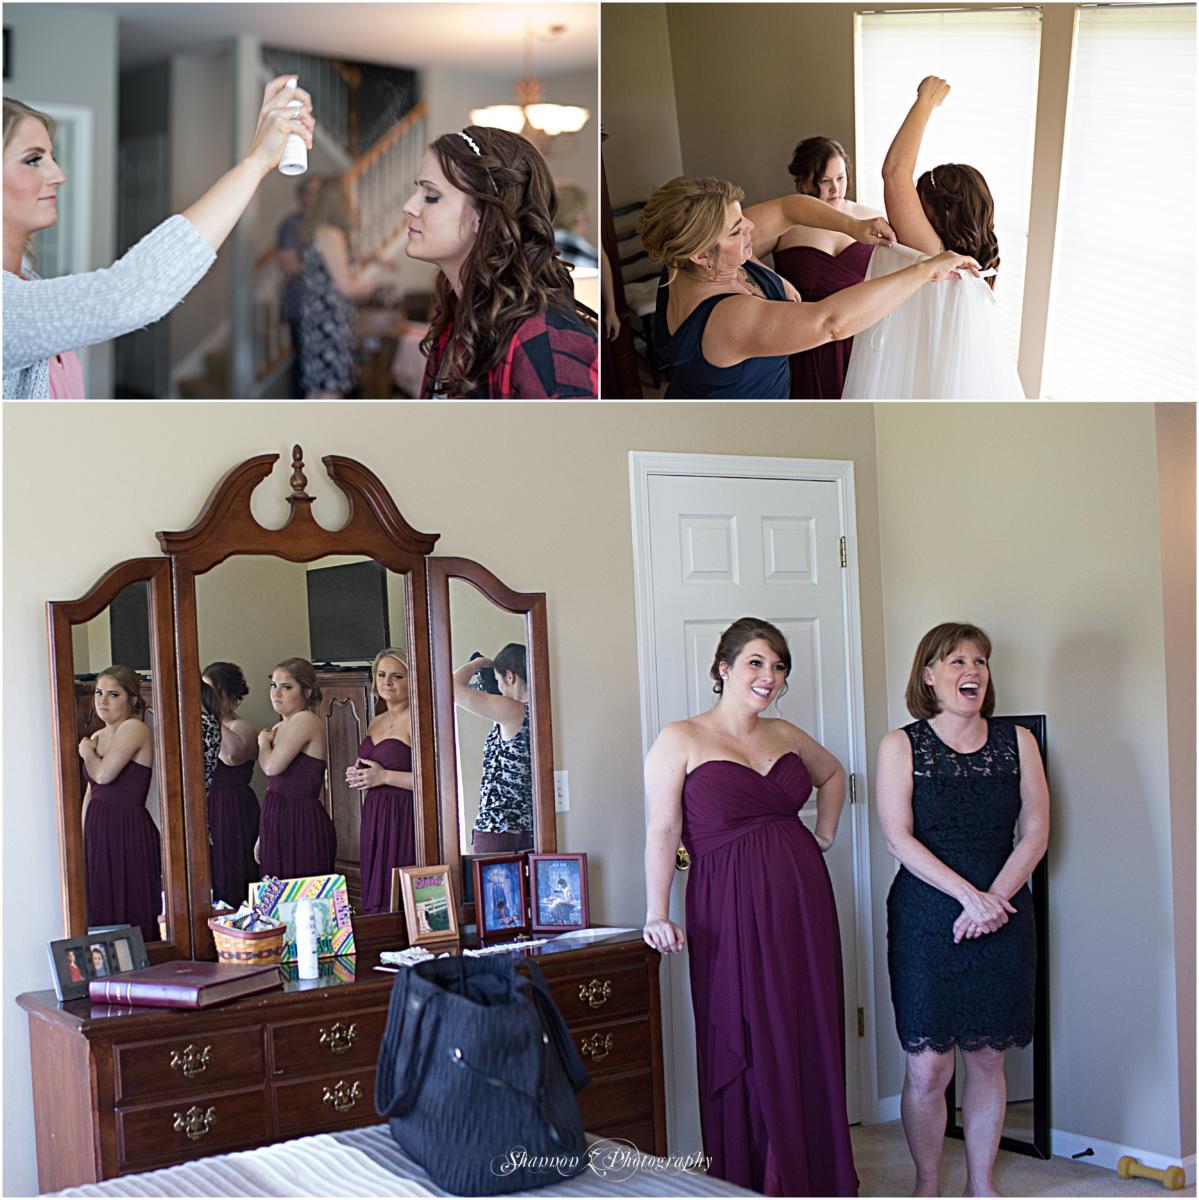 Byron-Colby-Barn-Wedding-Photos-5